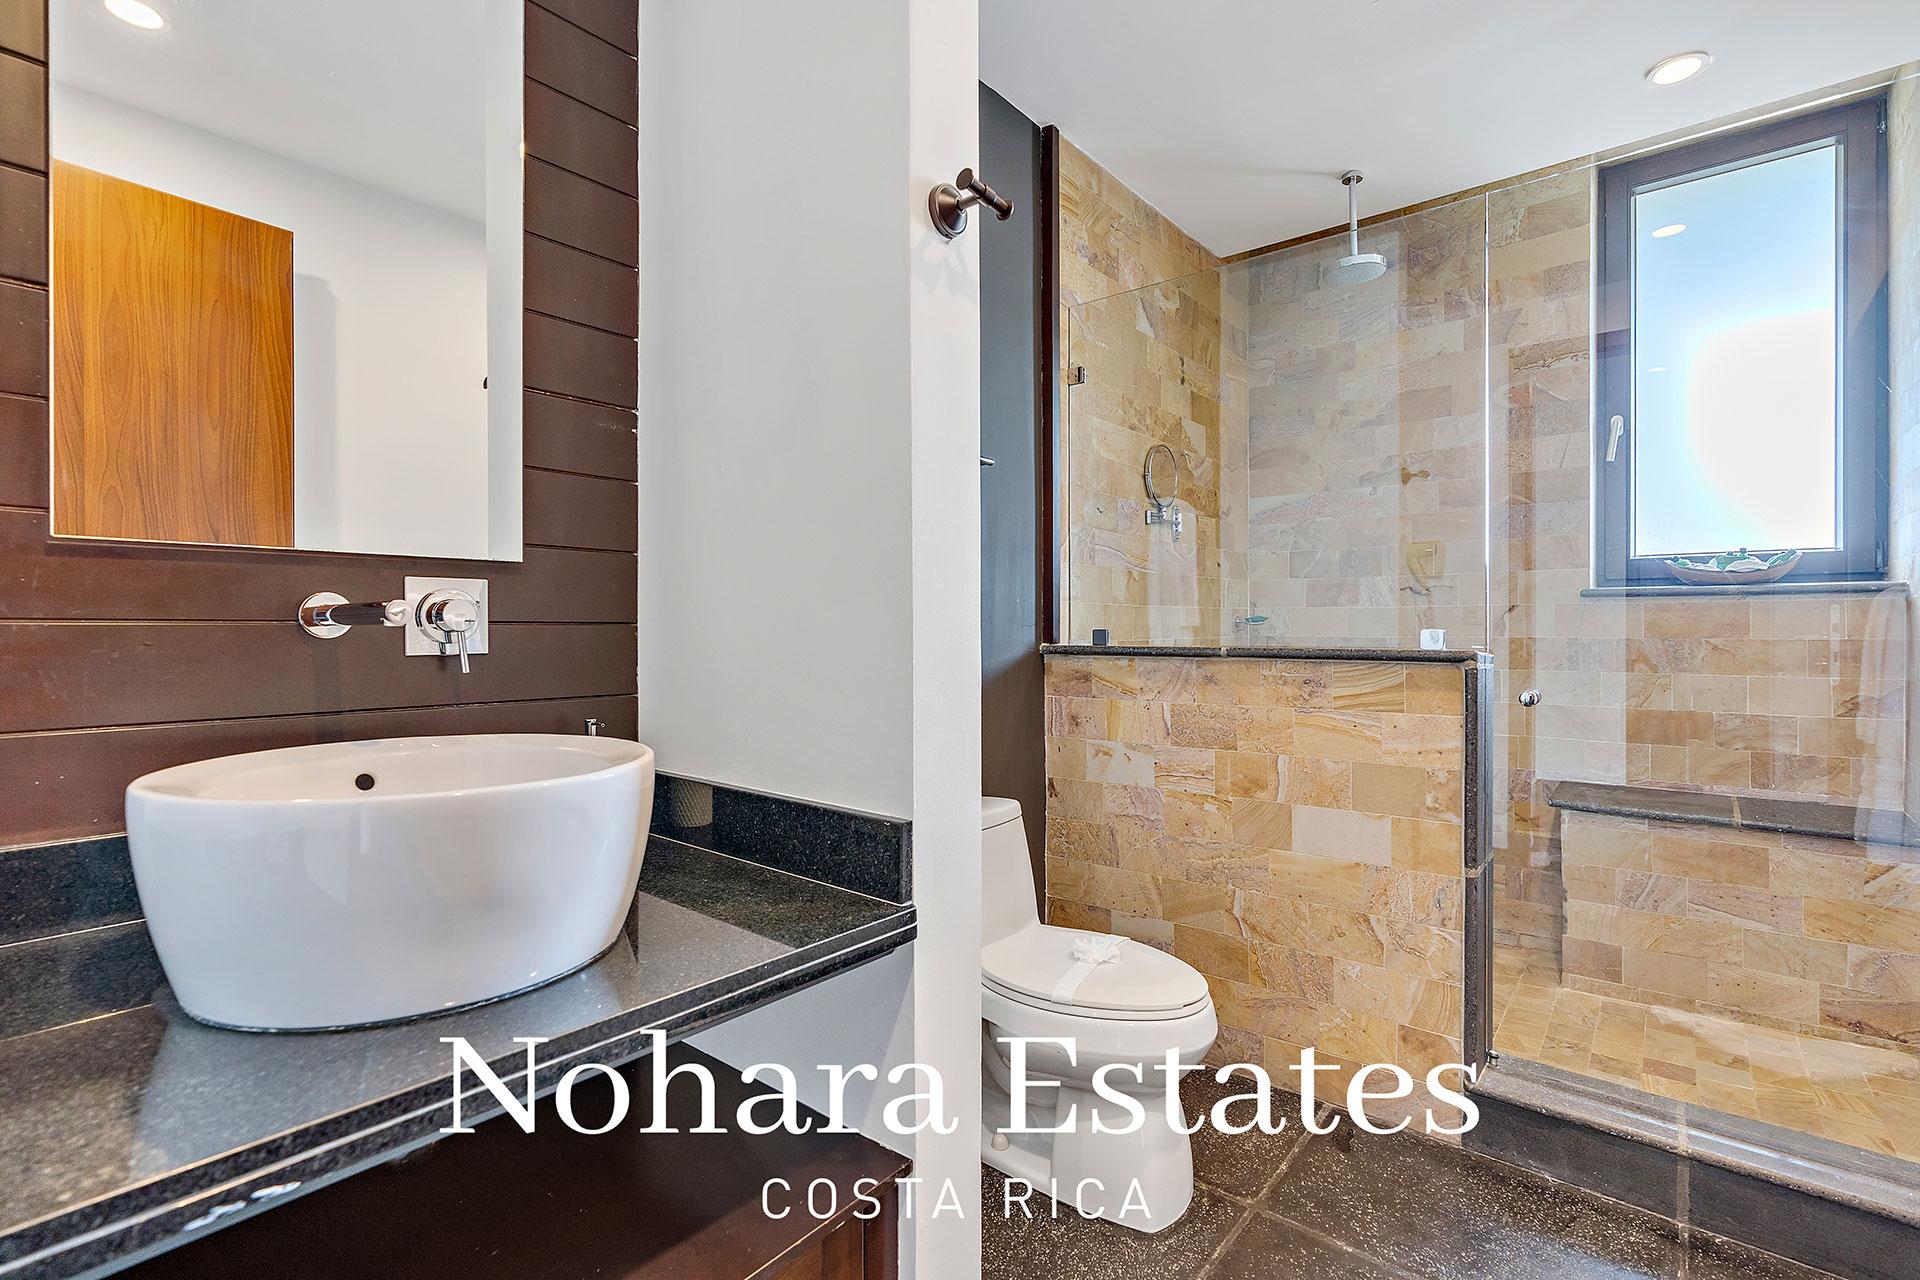 Nohara Estates Costa Rica 122 Apartment Quepos Los Altos 13